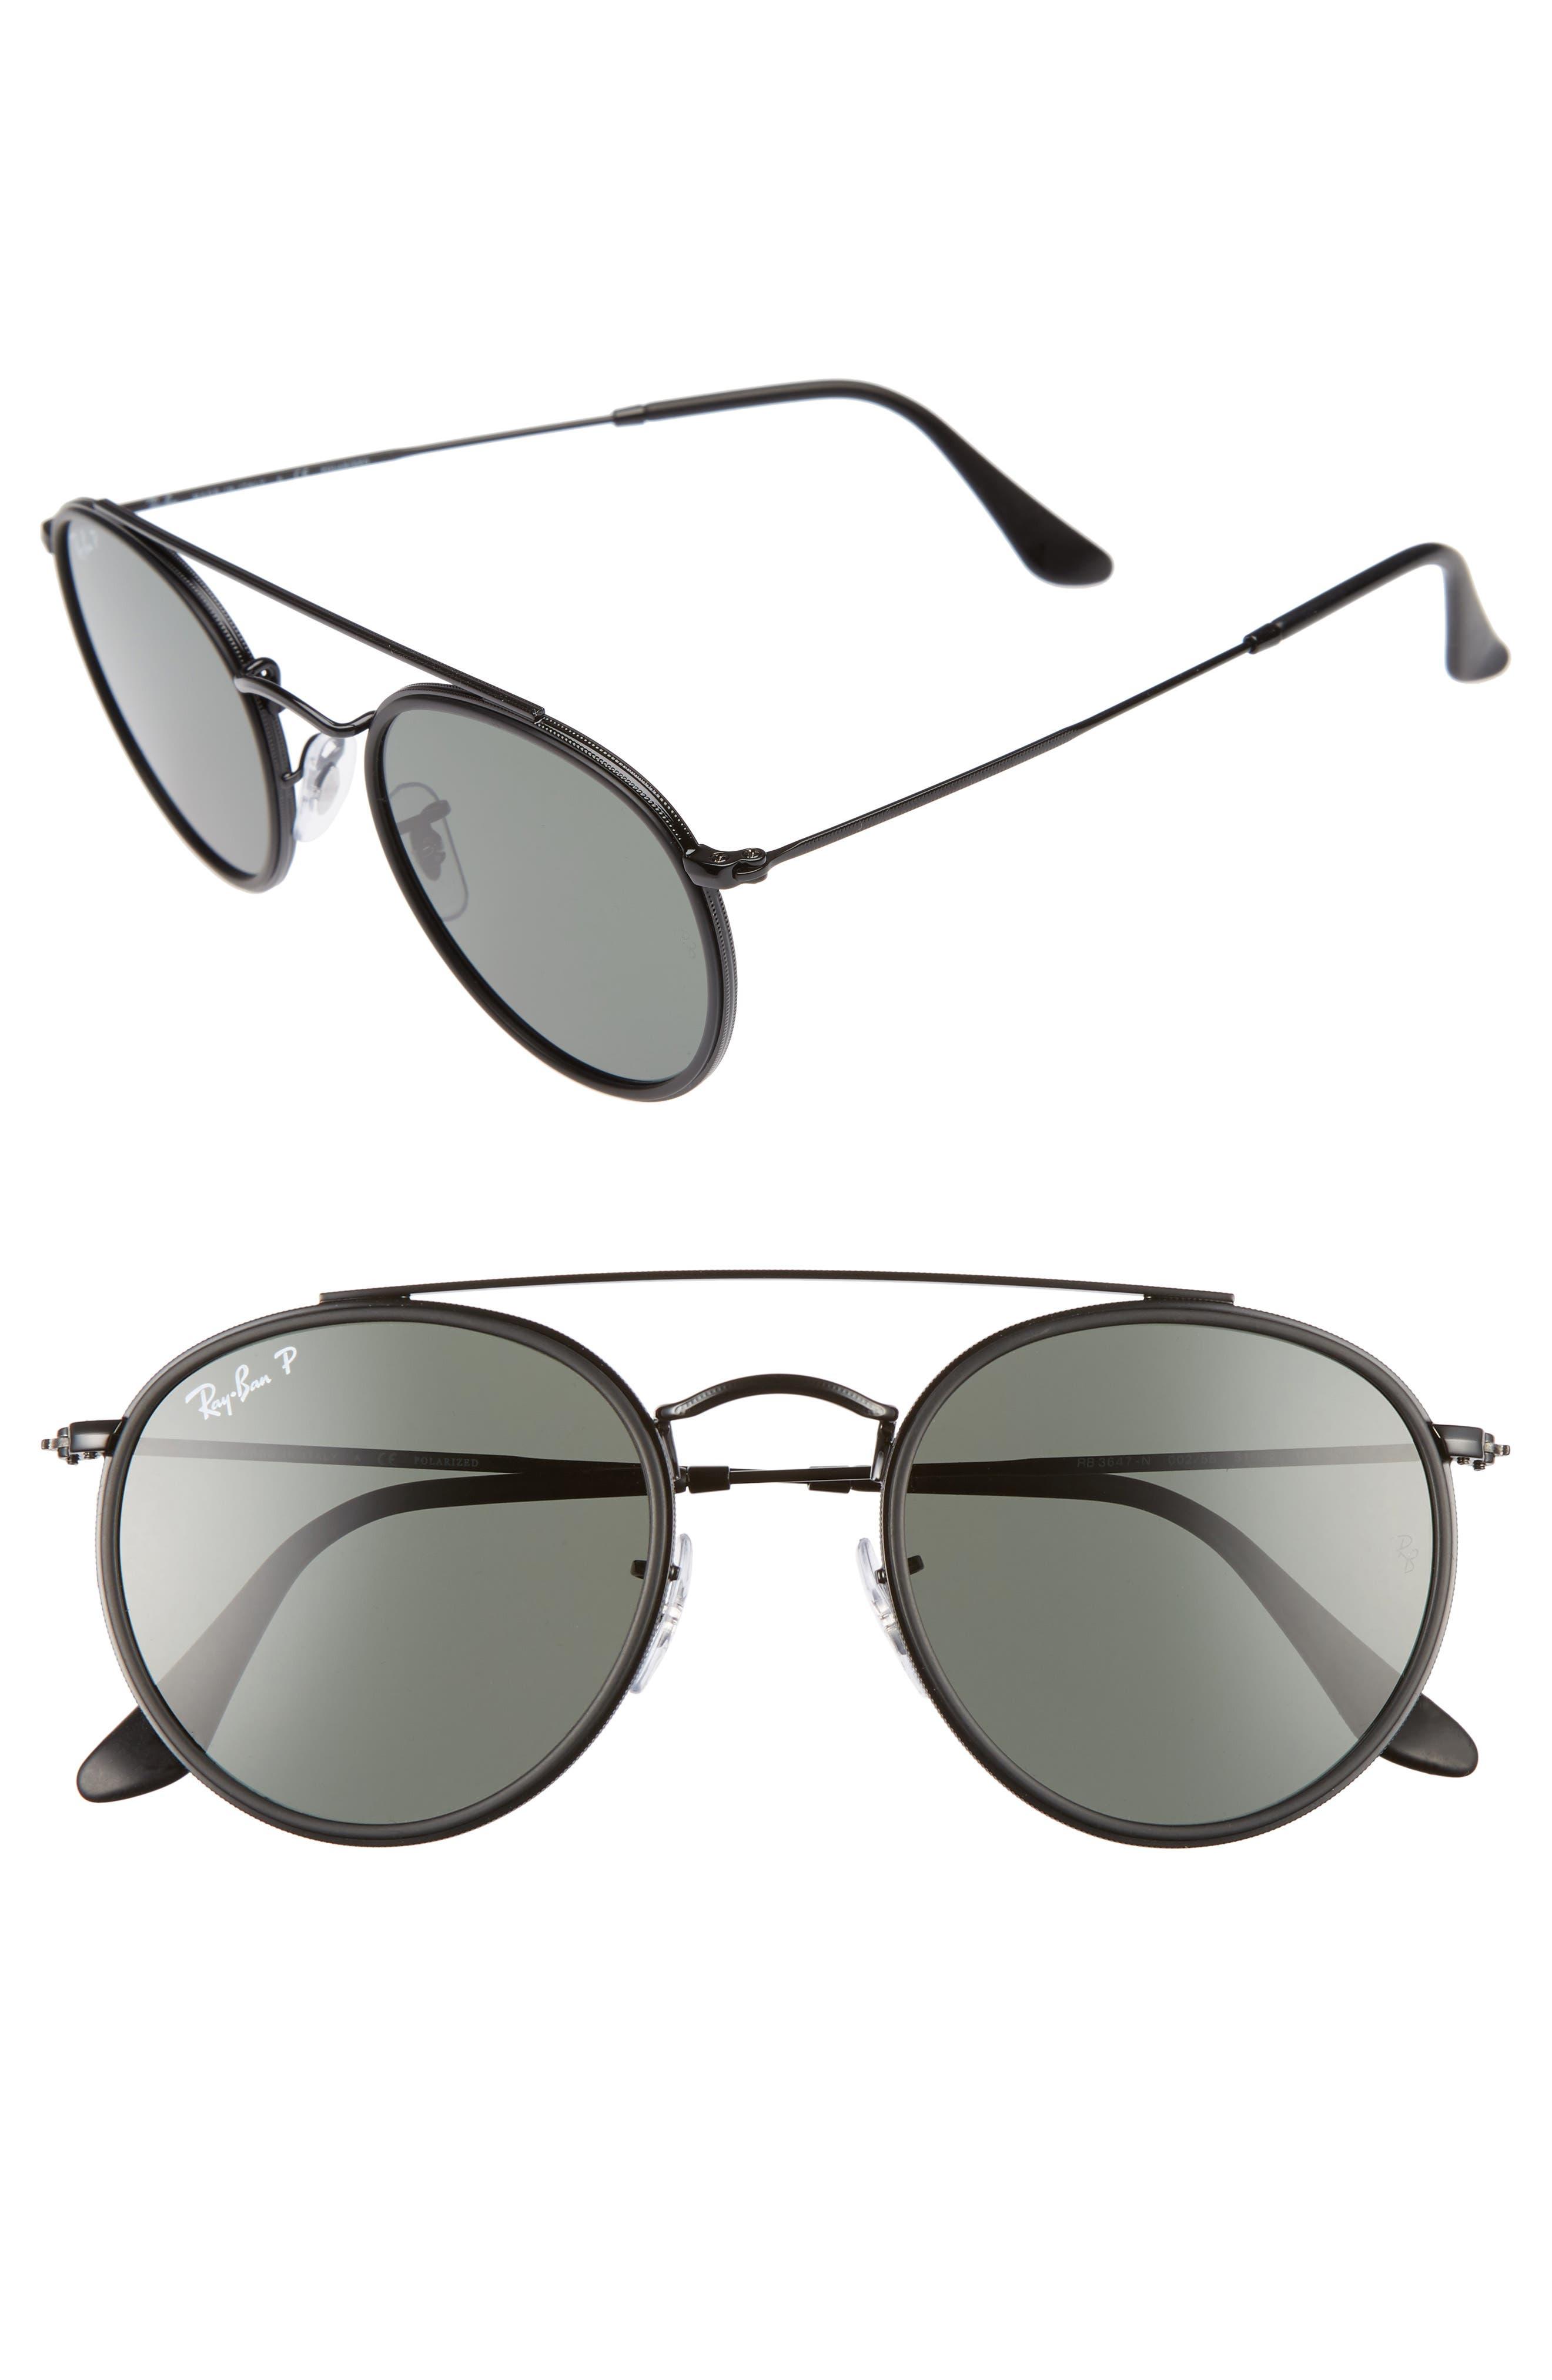 51mm Polarized Round Sunglasses,                             Alternate thumbnail 2, color,                             001